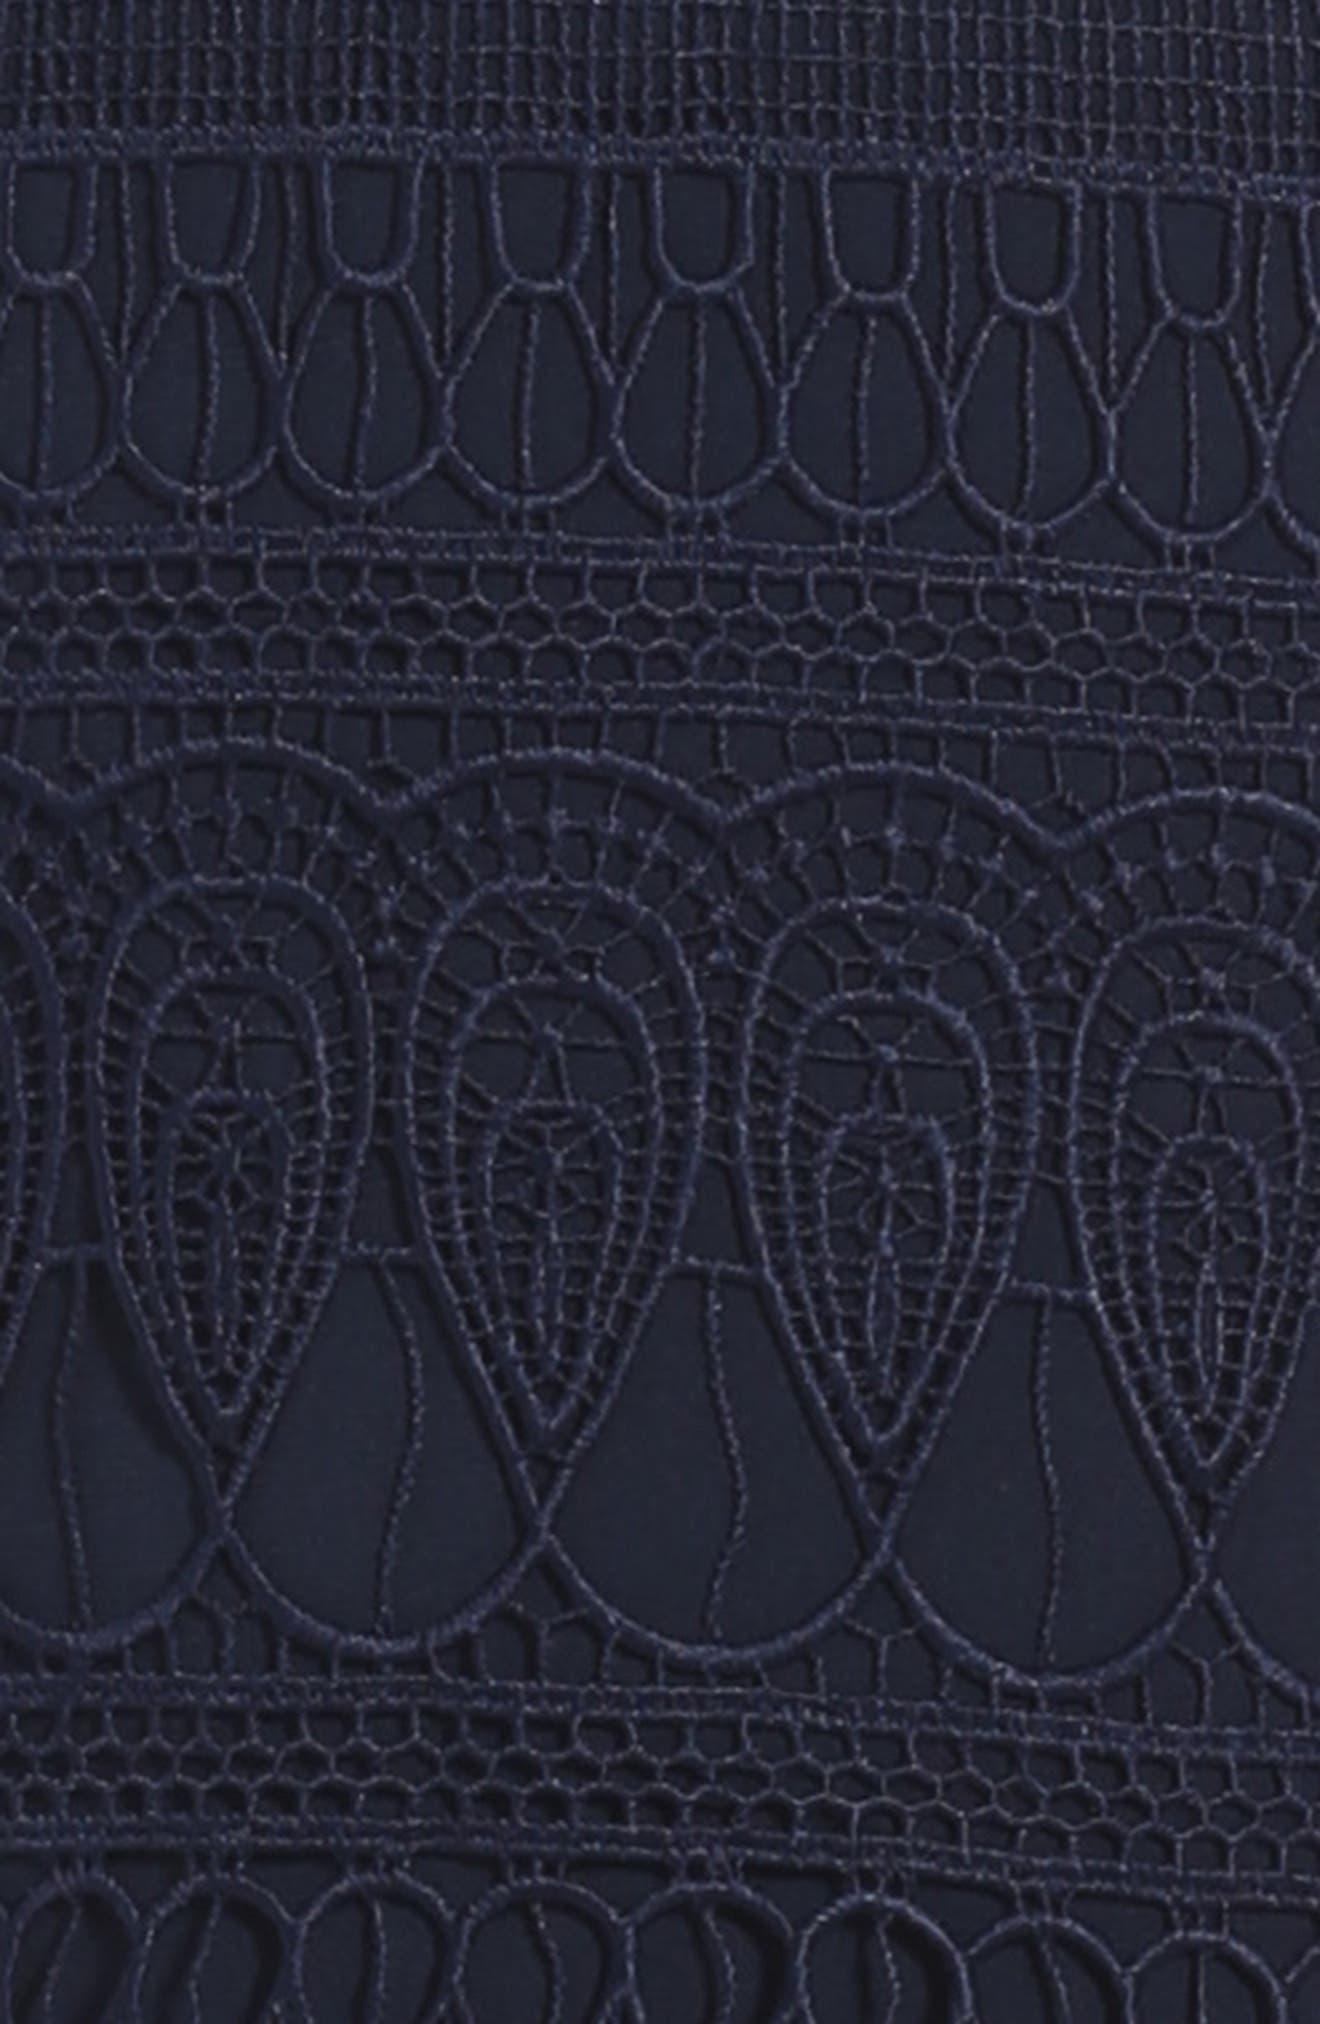 Junior Linear Lace Dress,                             Alternate thumbnail 3, color,                             Navy